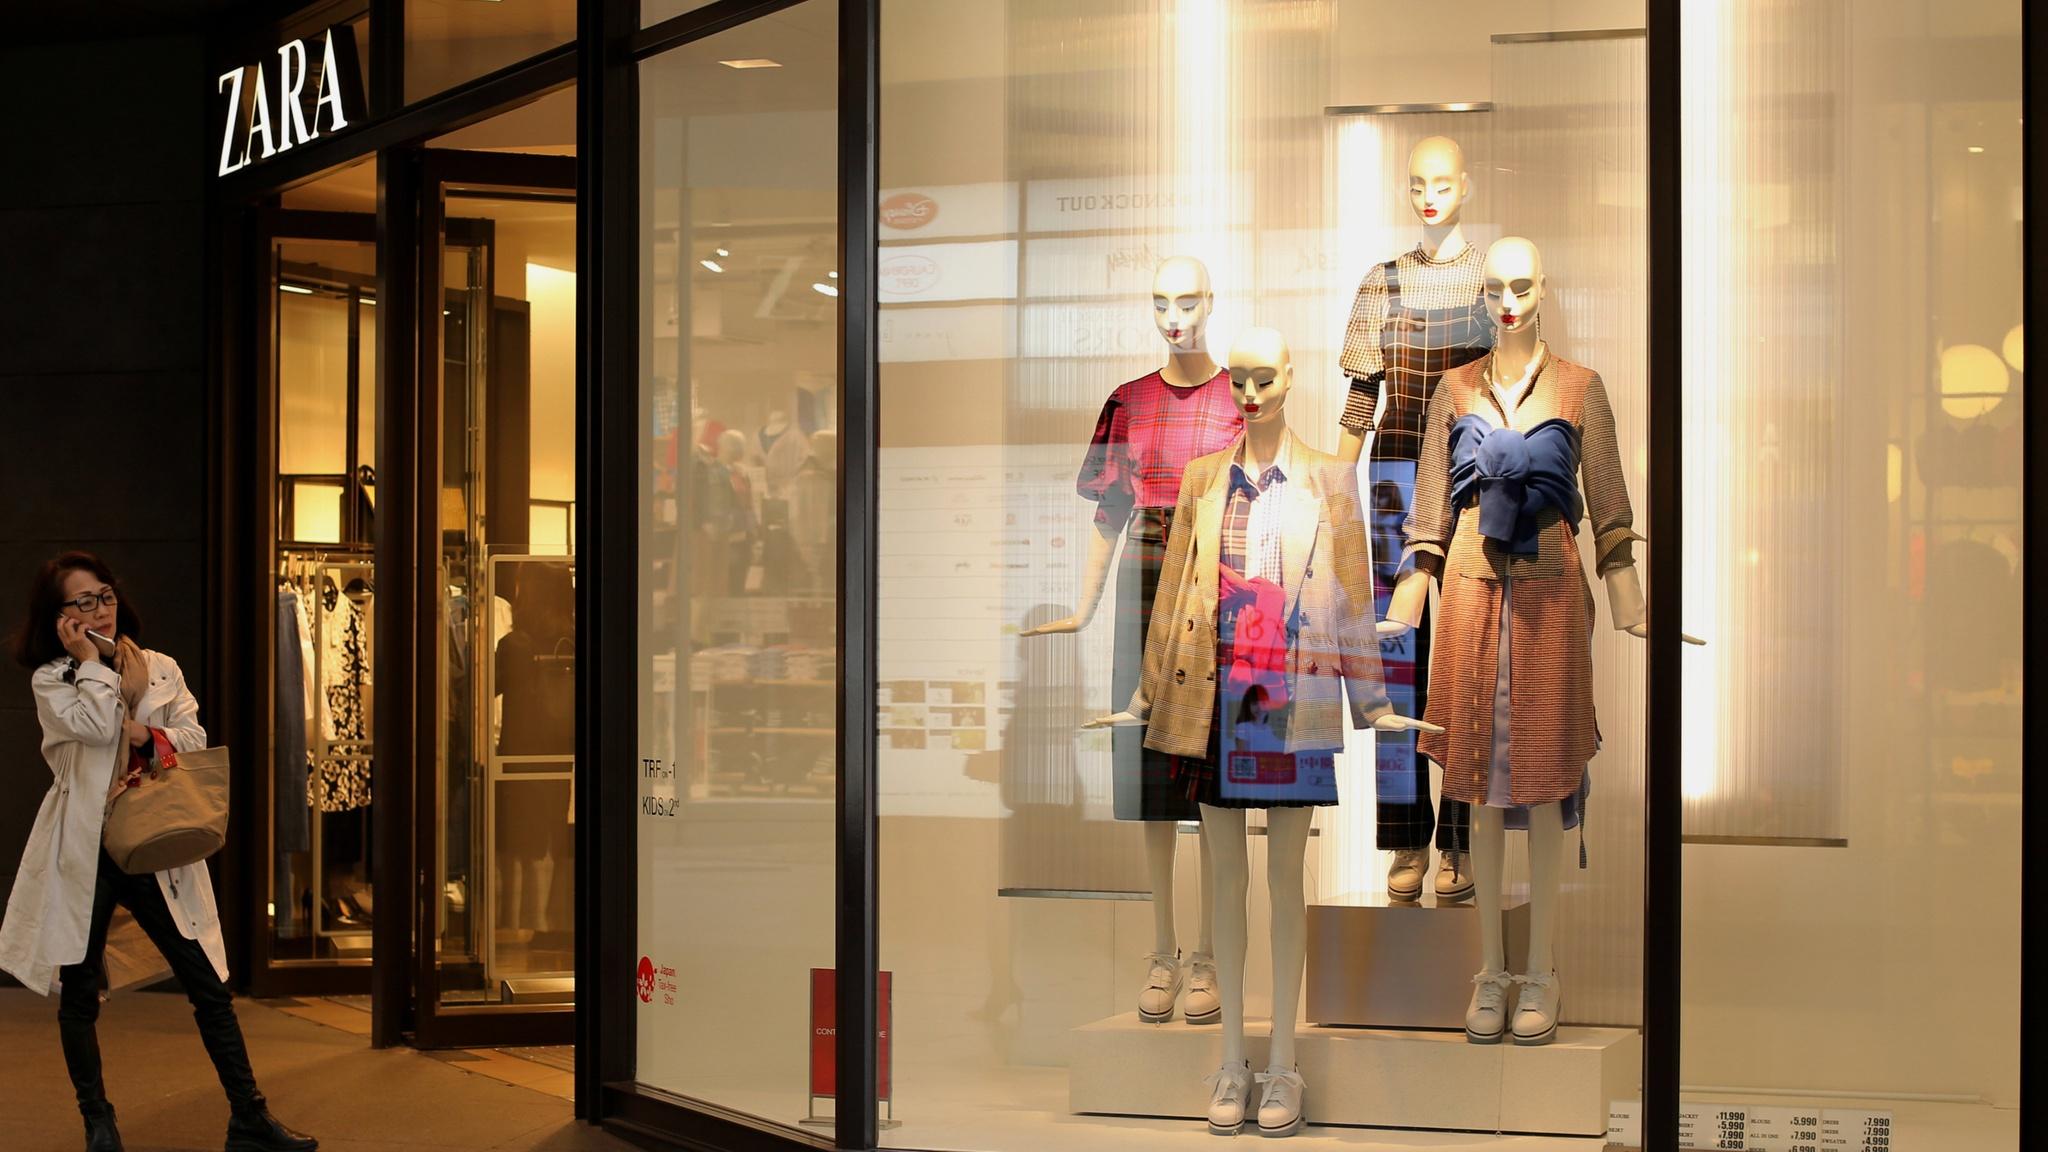 Zara parent Inditex lifts dividend on higher online sales